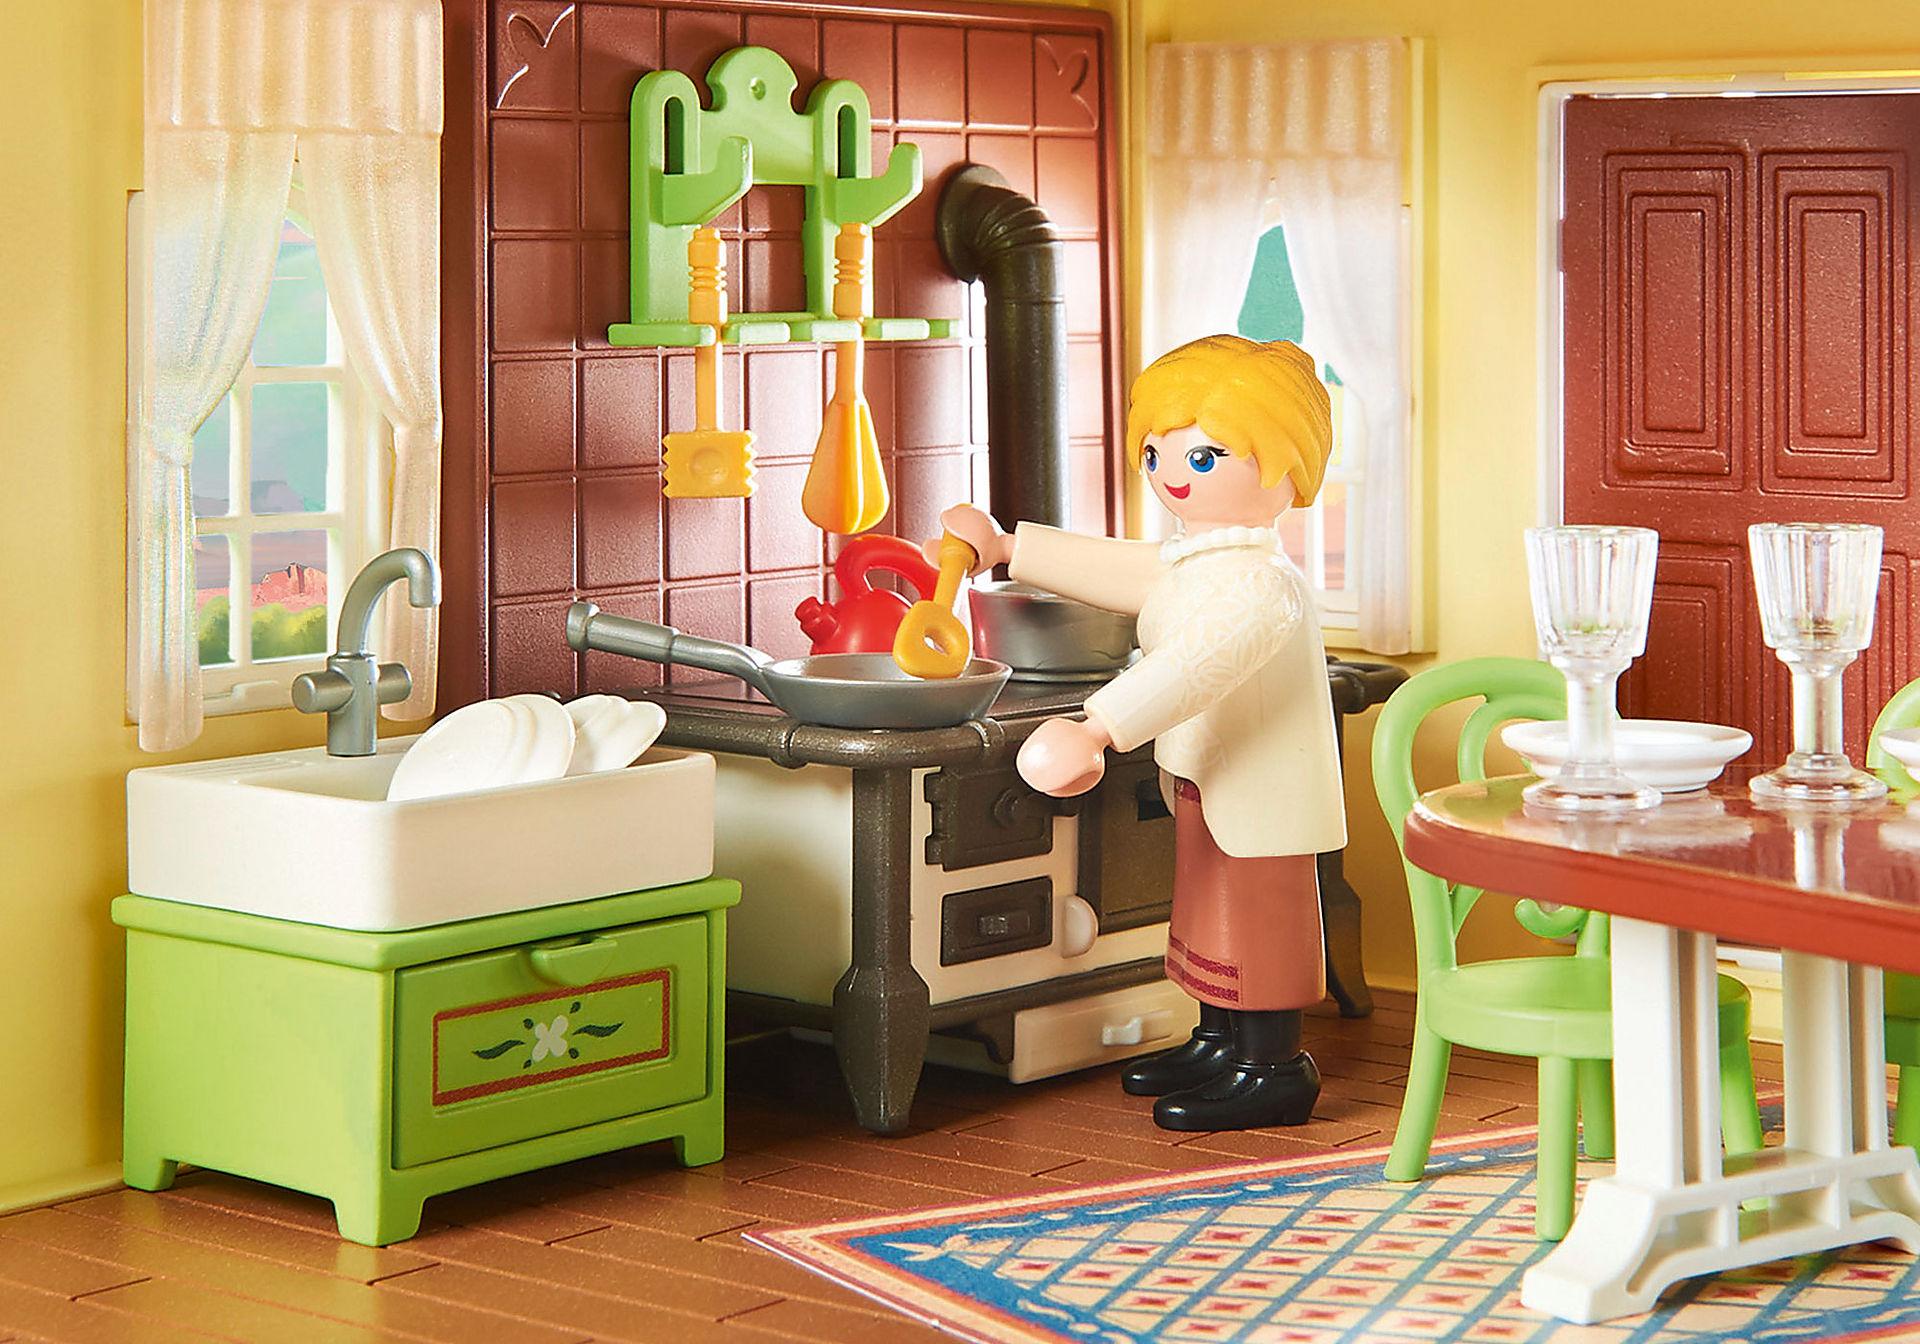 http://media.playmobil.com/i/playmobil/9475_product_extra1/Luckys glückliches Zuhause